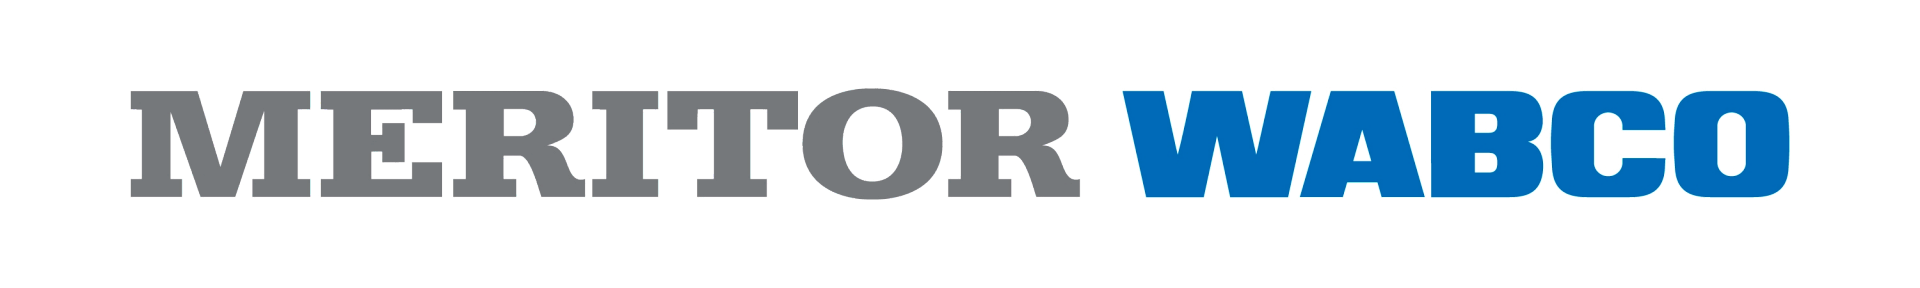 Meritor Wabco Logo